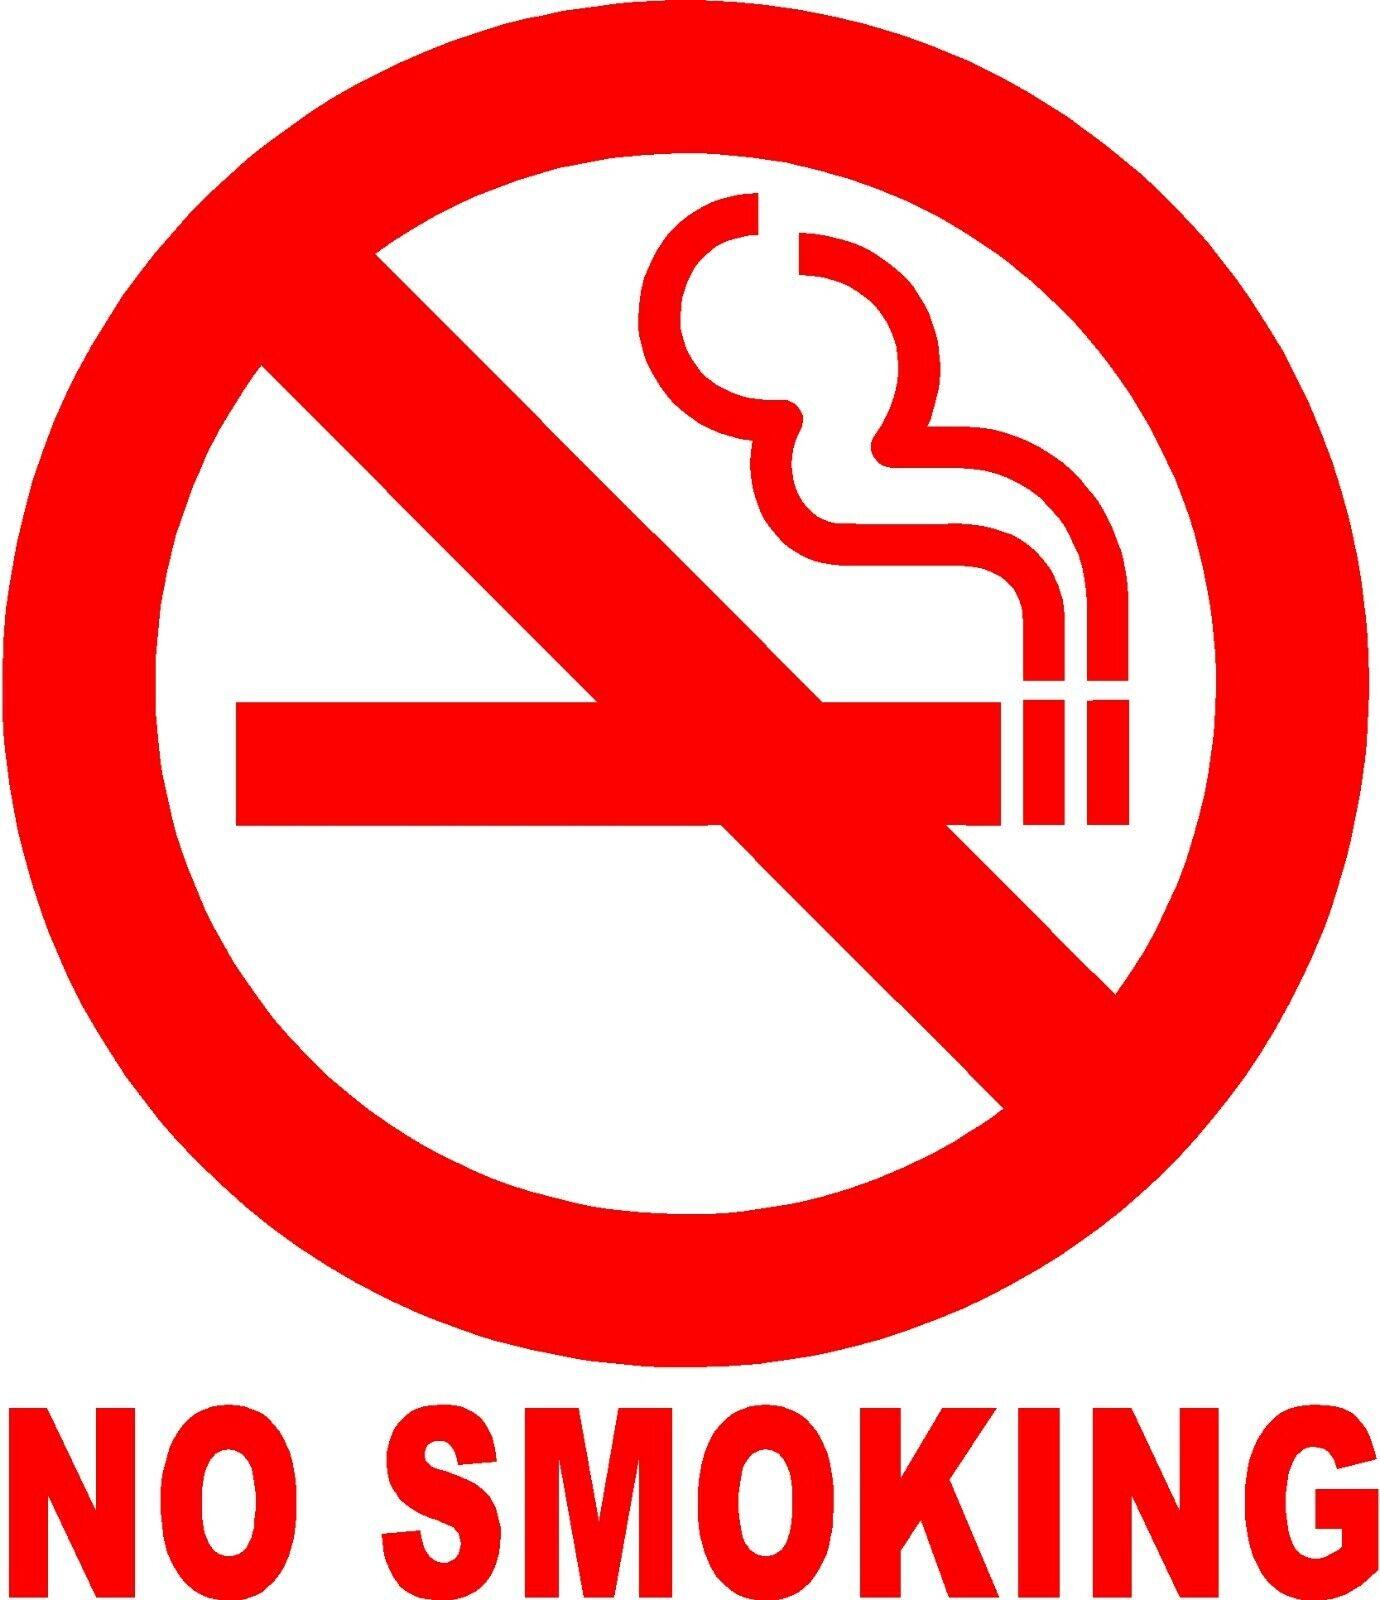 Home Decoration - NO SMOKING Circle Sign Vinyl Decal Sticker